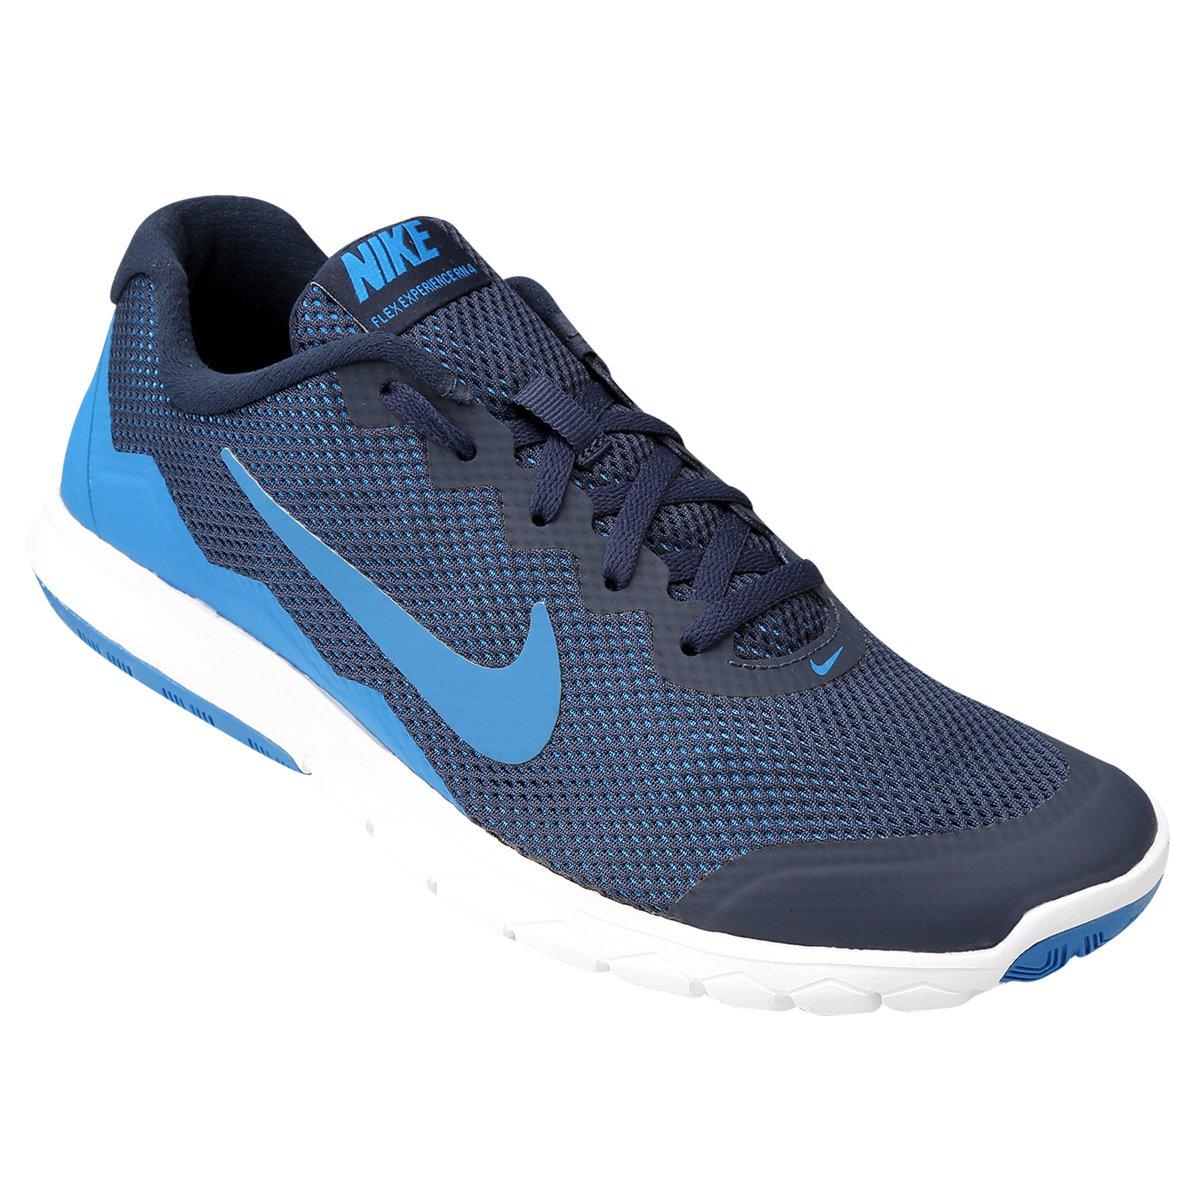 7734d0c3784 Tênis Nike Flex Experience RN 4 Masculino - Compre Agora